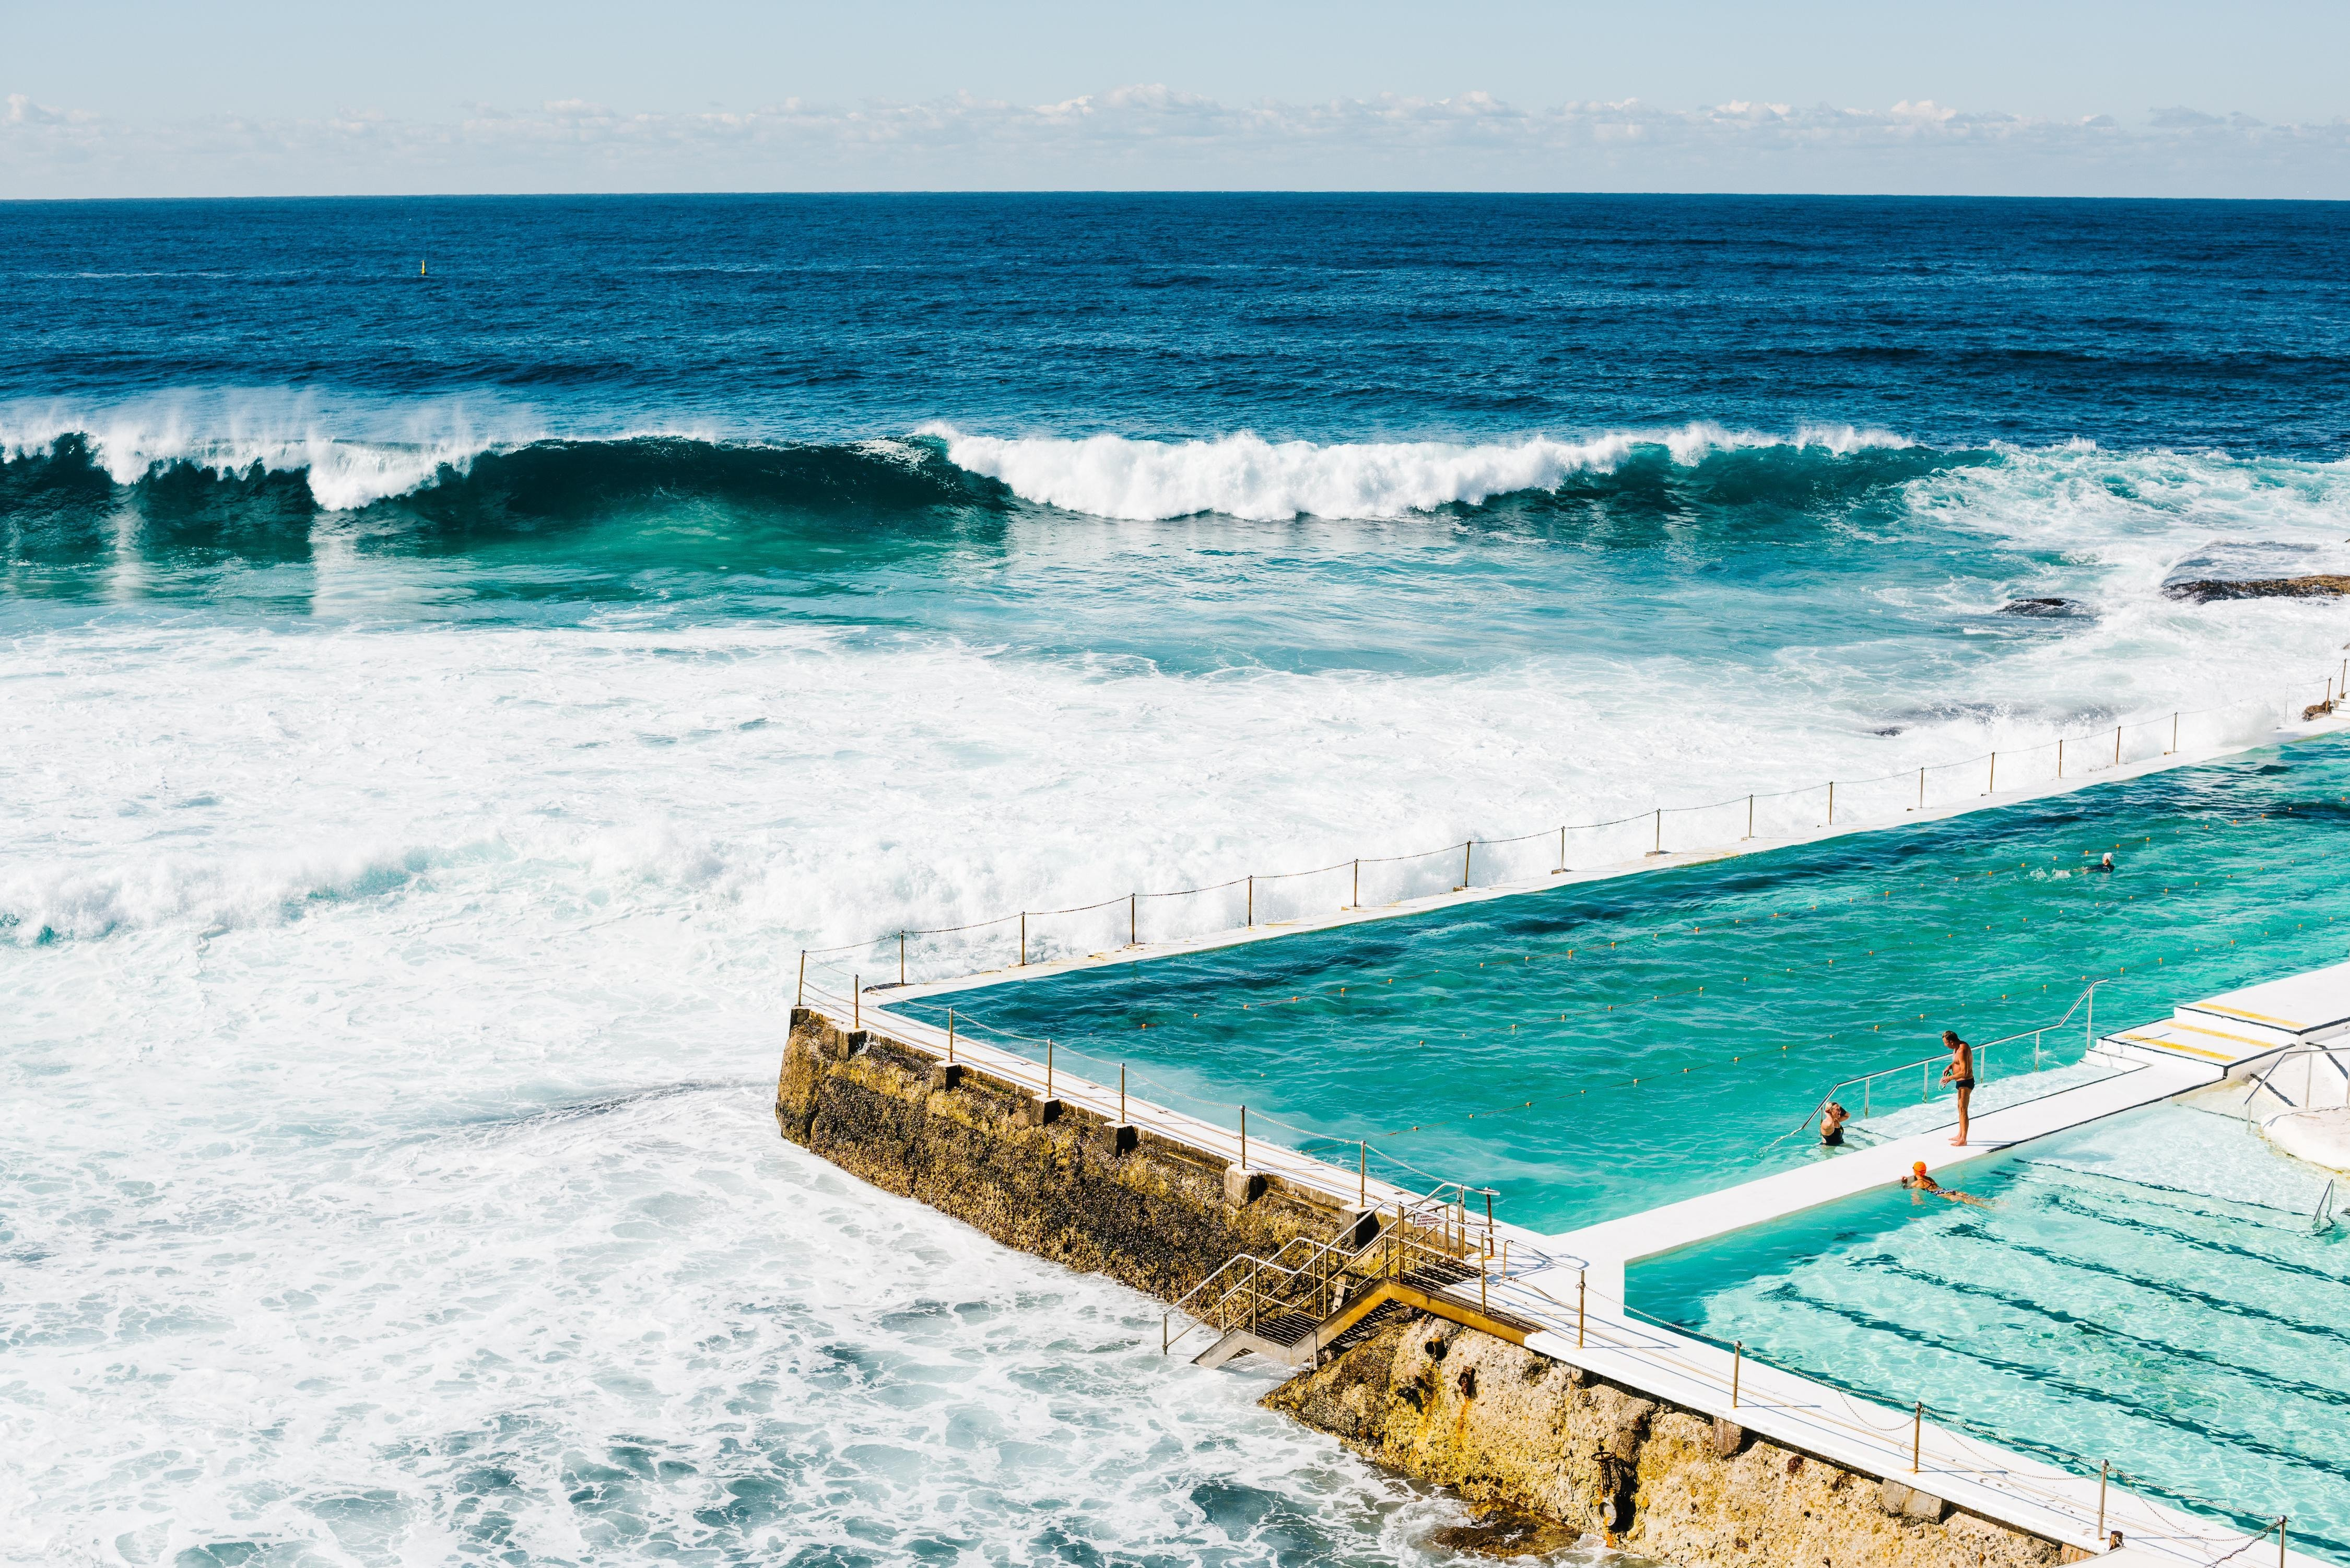 Sydney for Locals